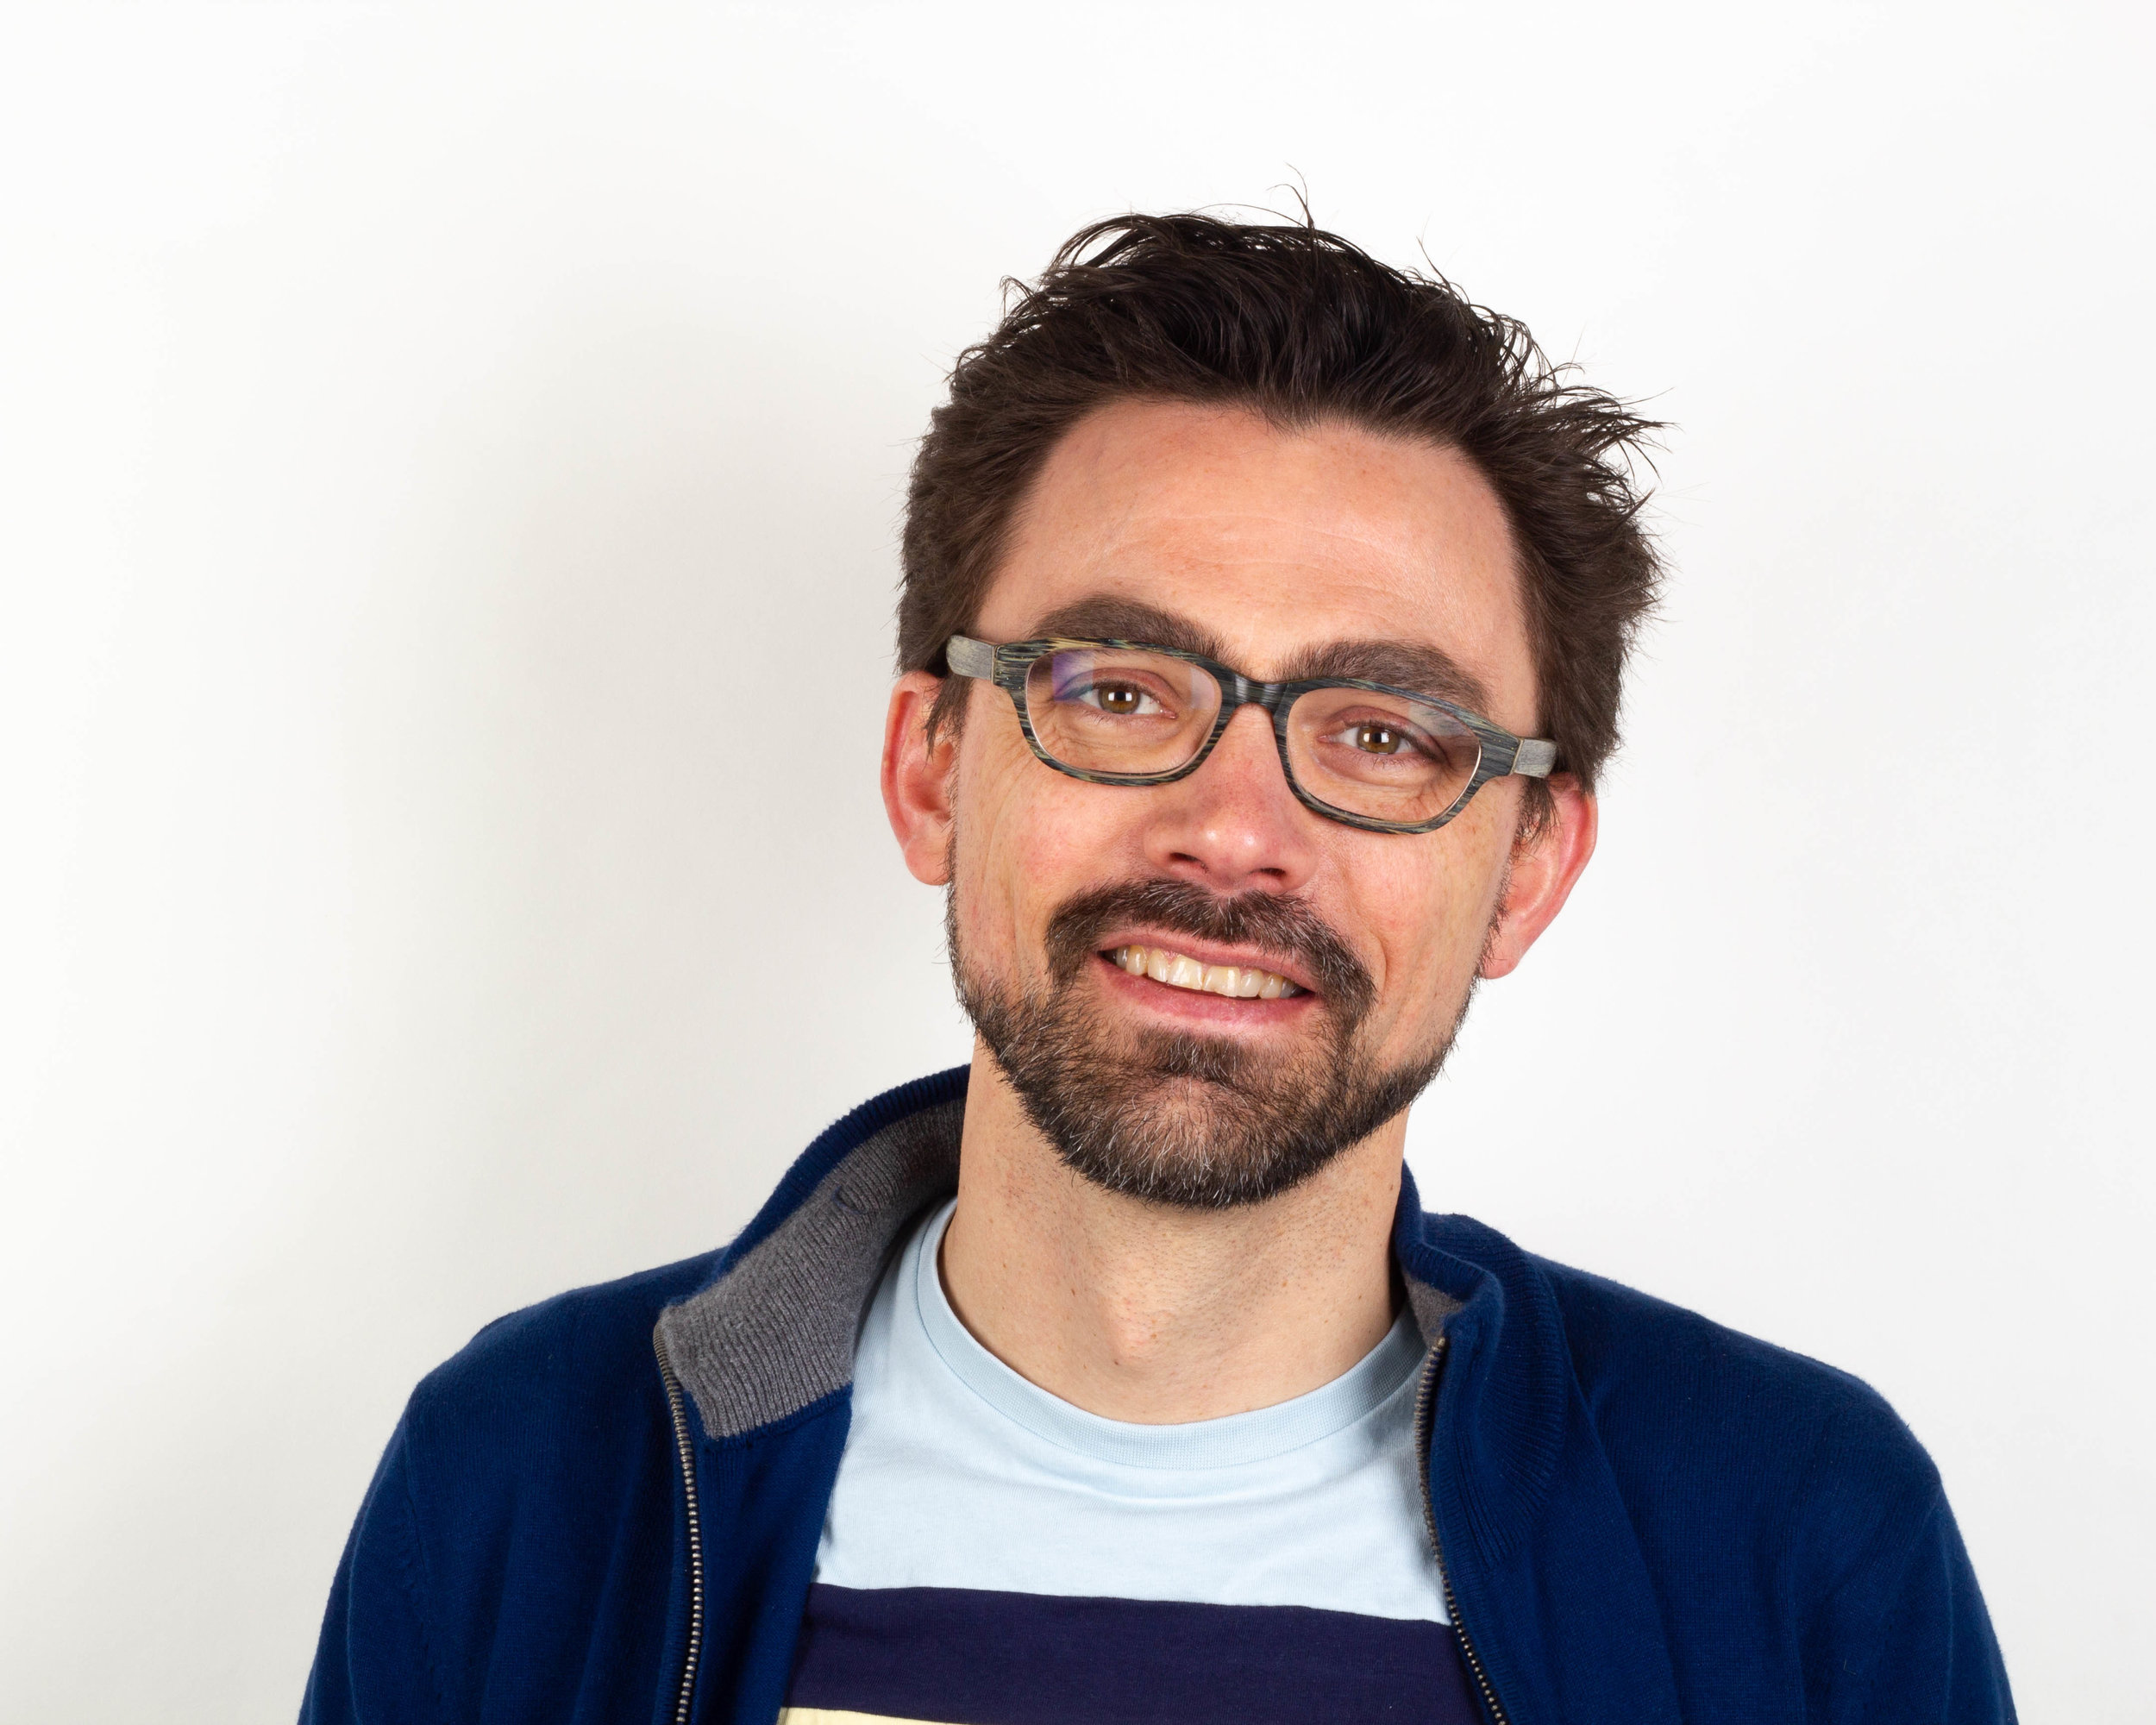 Martijn Kathman Trainer